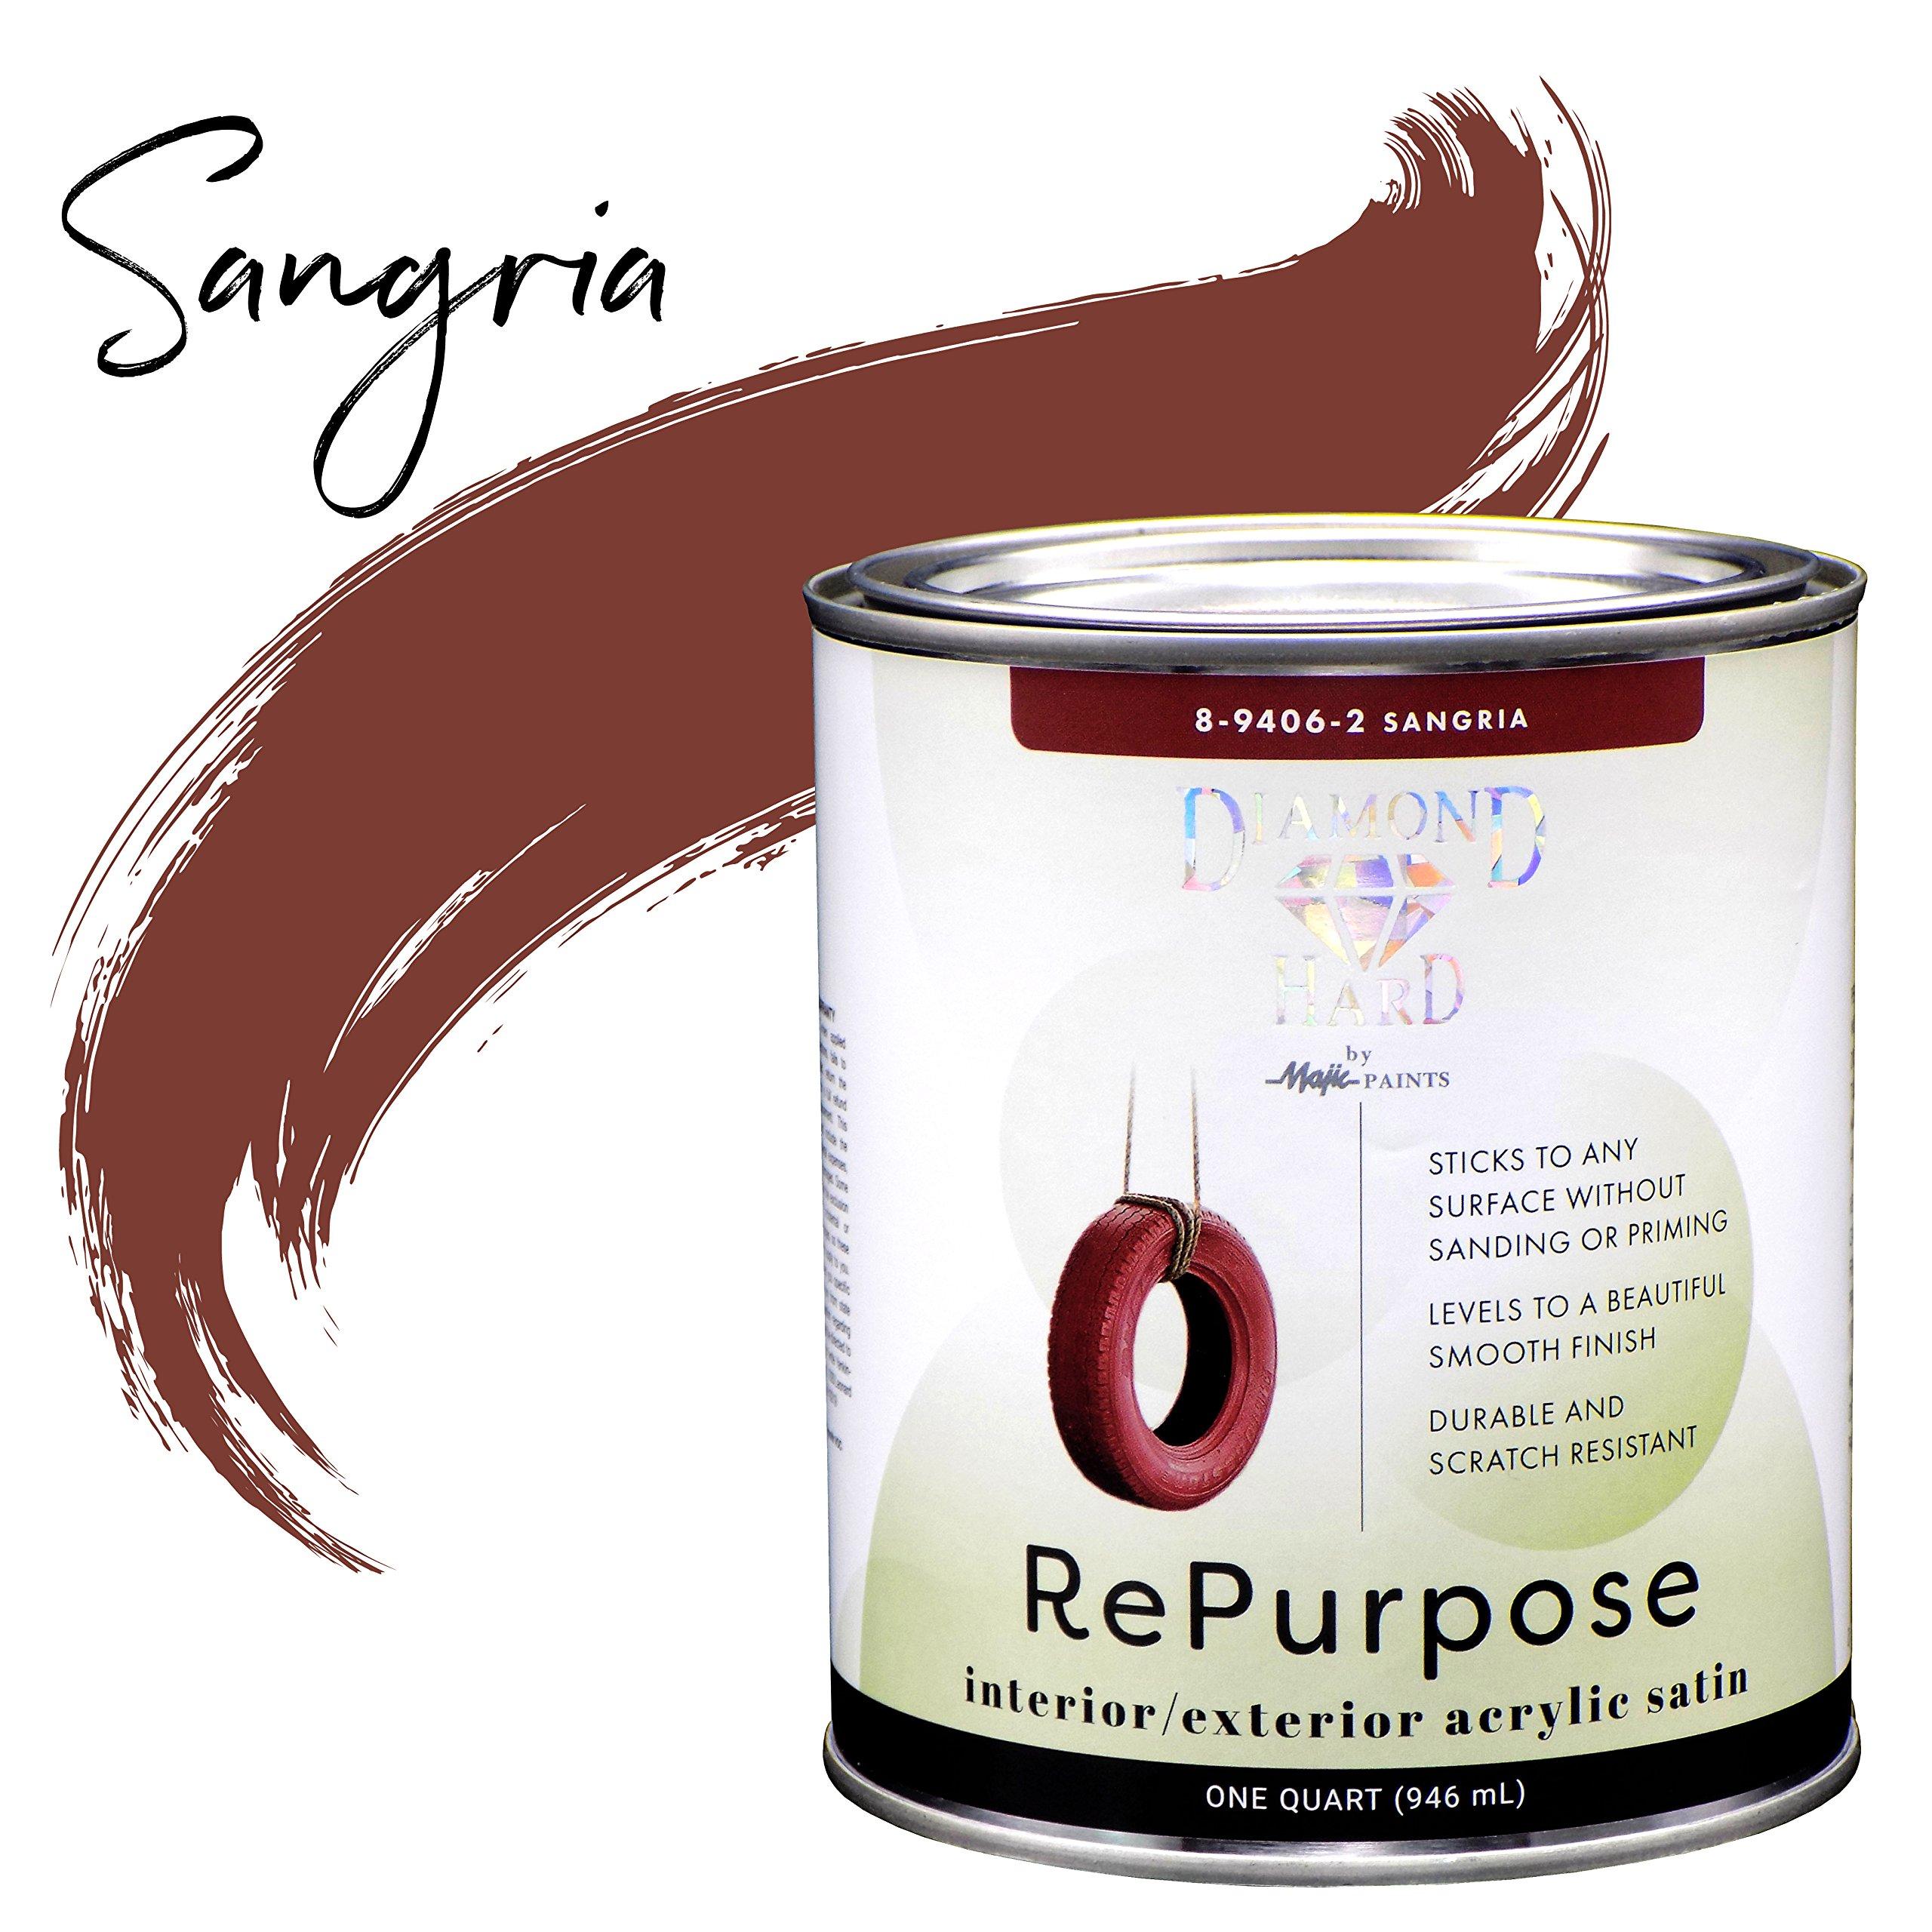 Majic Paints 8-9406-2 Diamond Hard Repurpose Enamel Paint for Interior Or Exterior, 1-Quart, Sangria Red